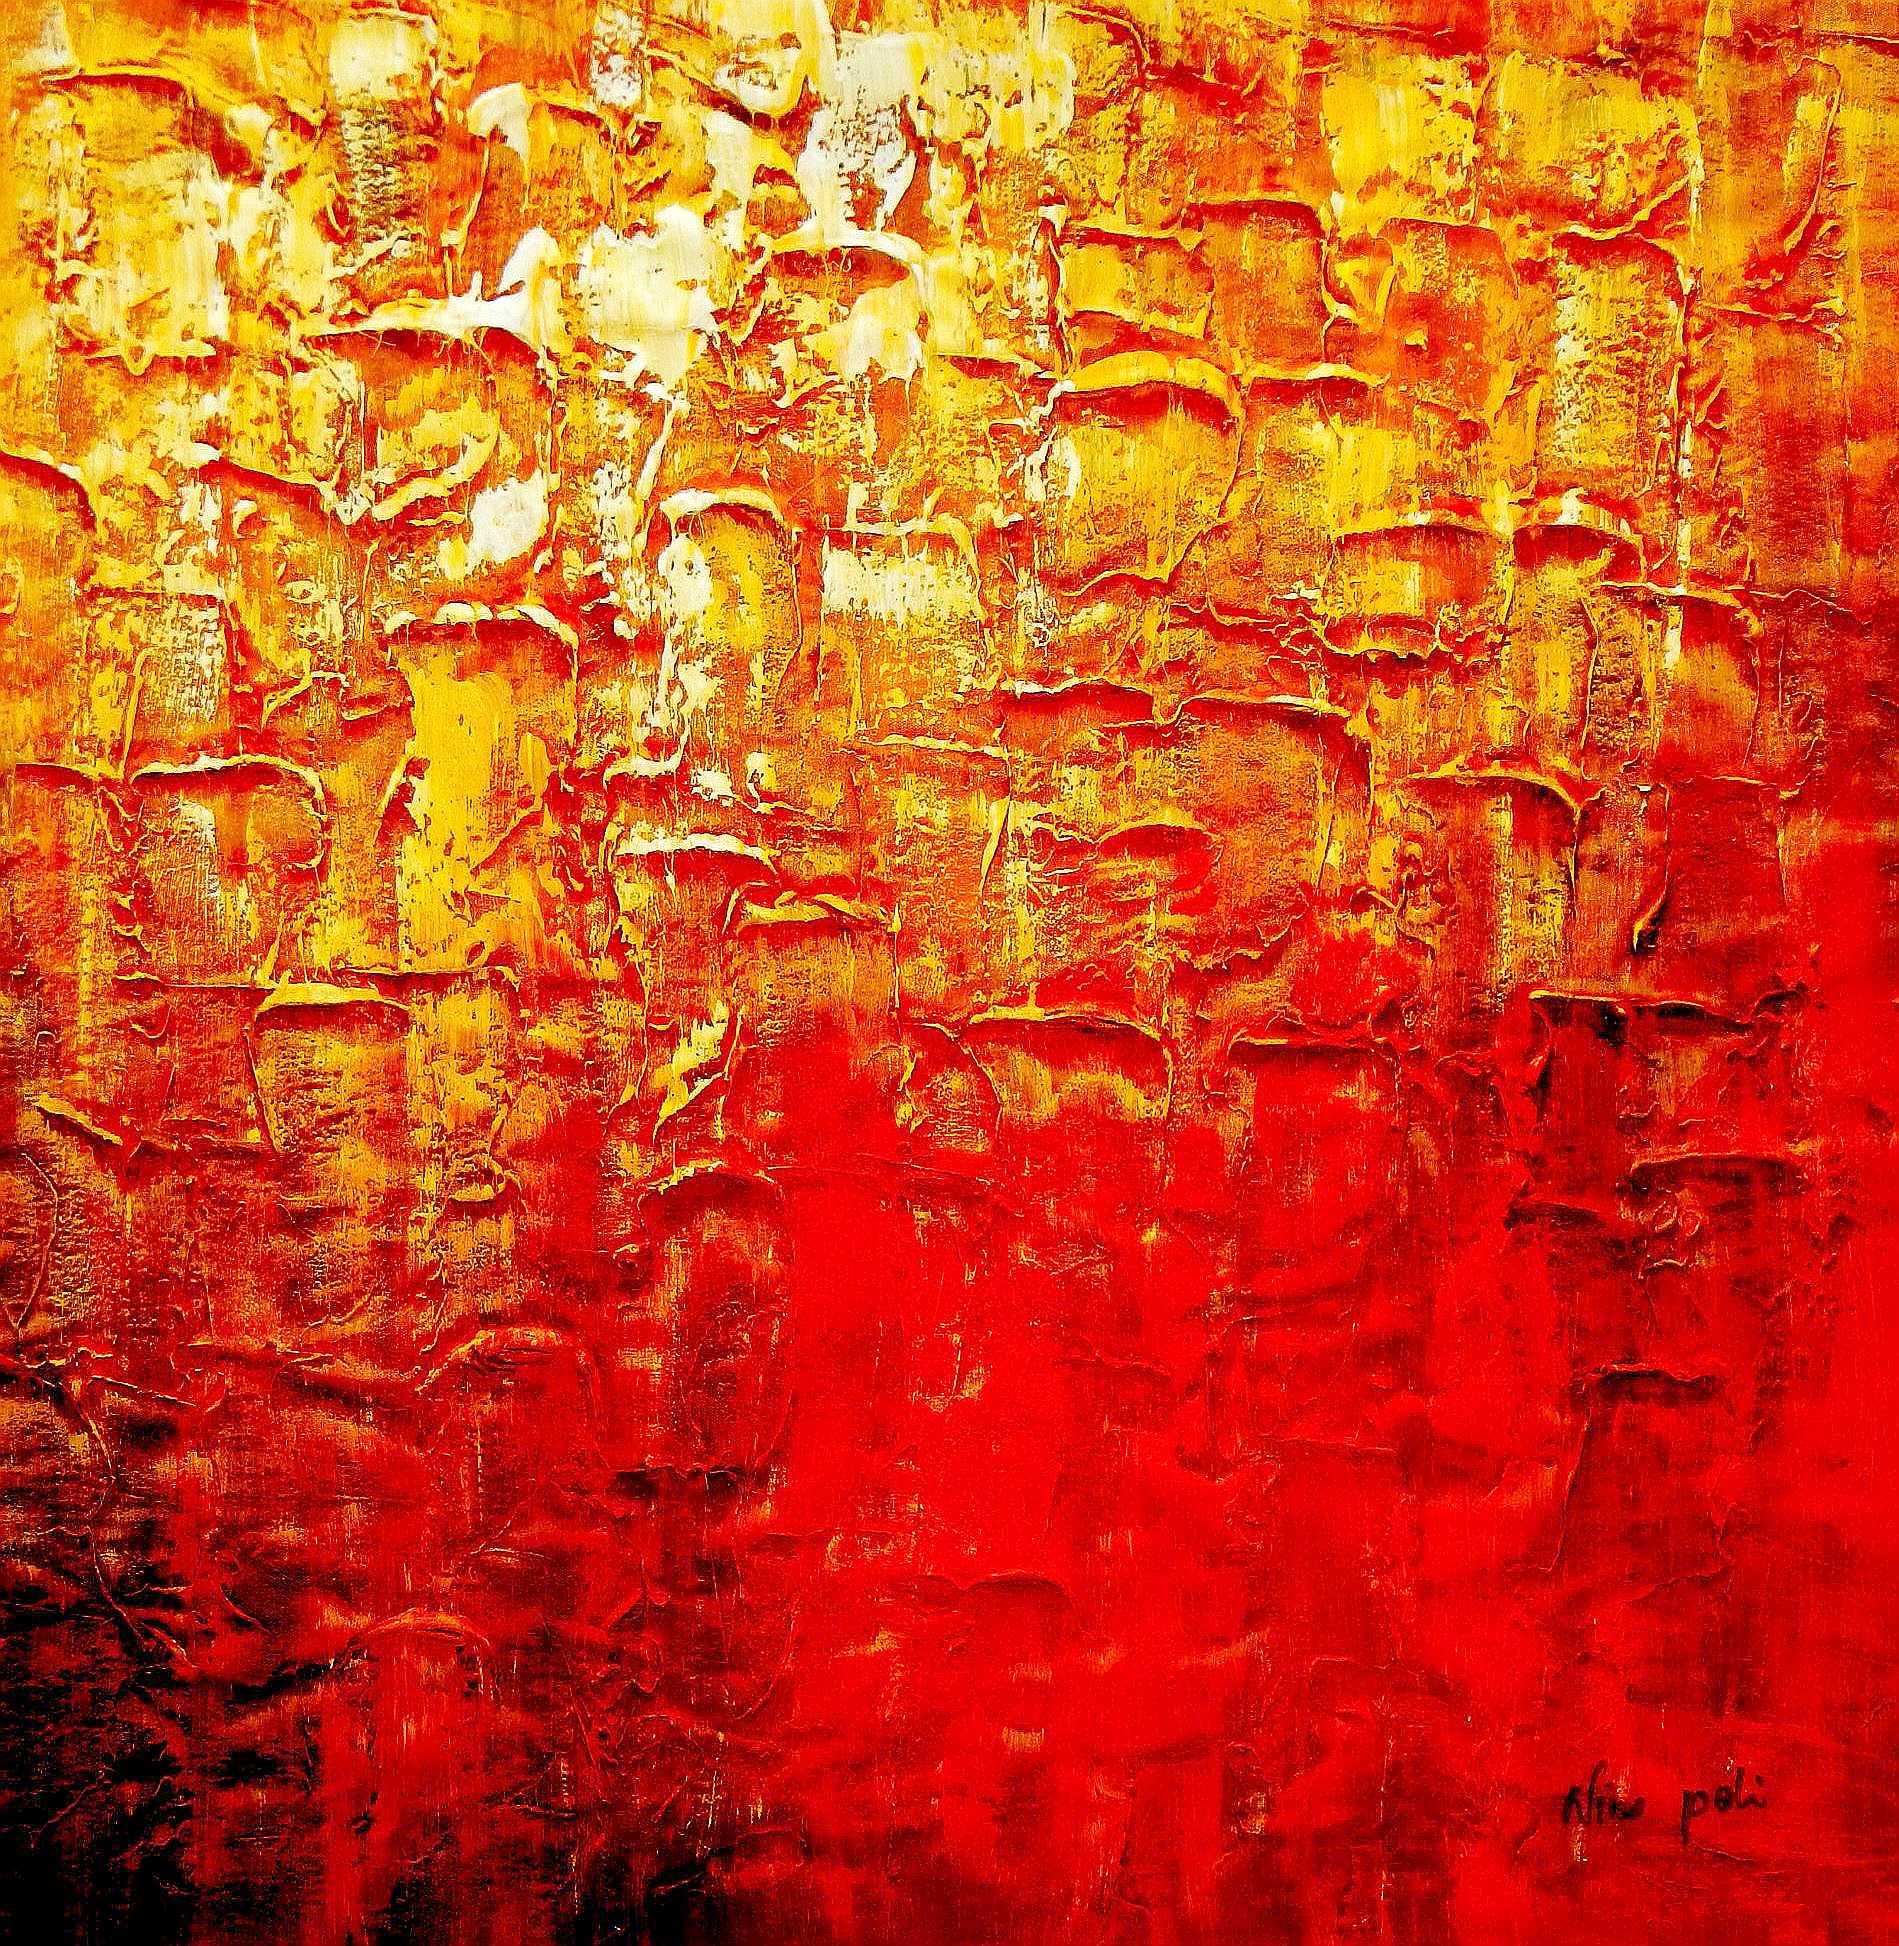 Abstract - Legacy of Fire III g94951 80x80cm abstraktes Ölbild handgemalt